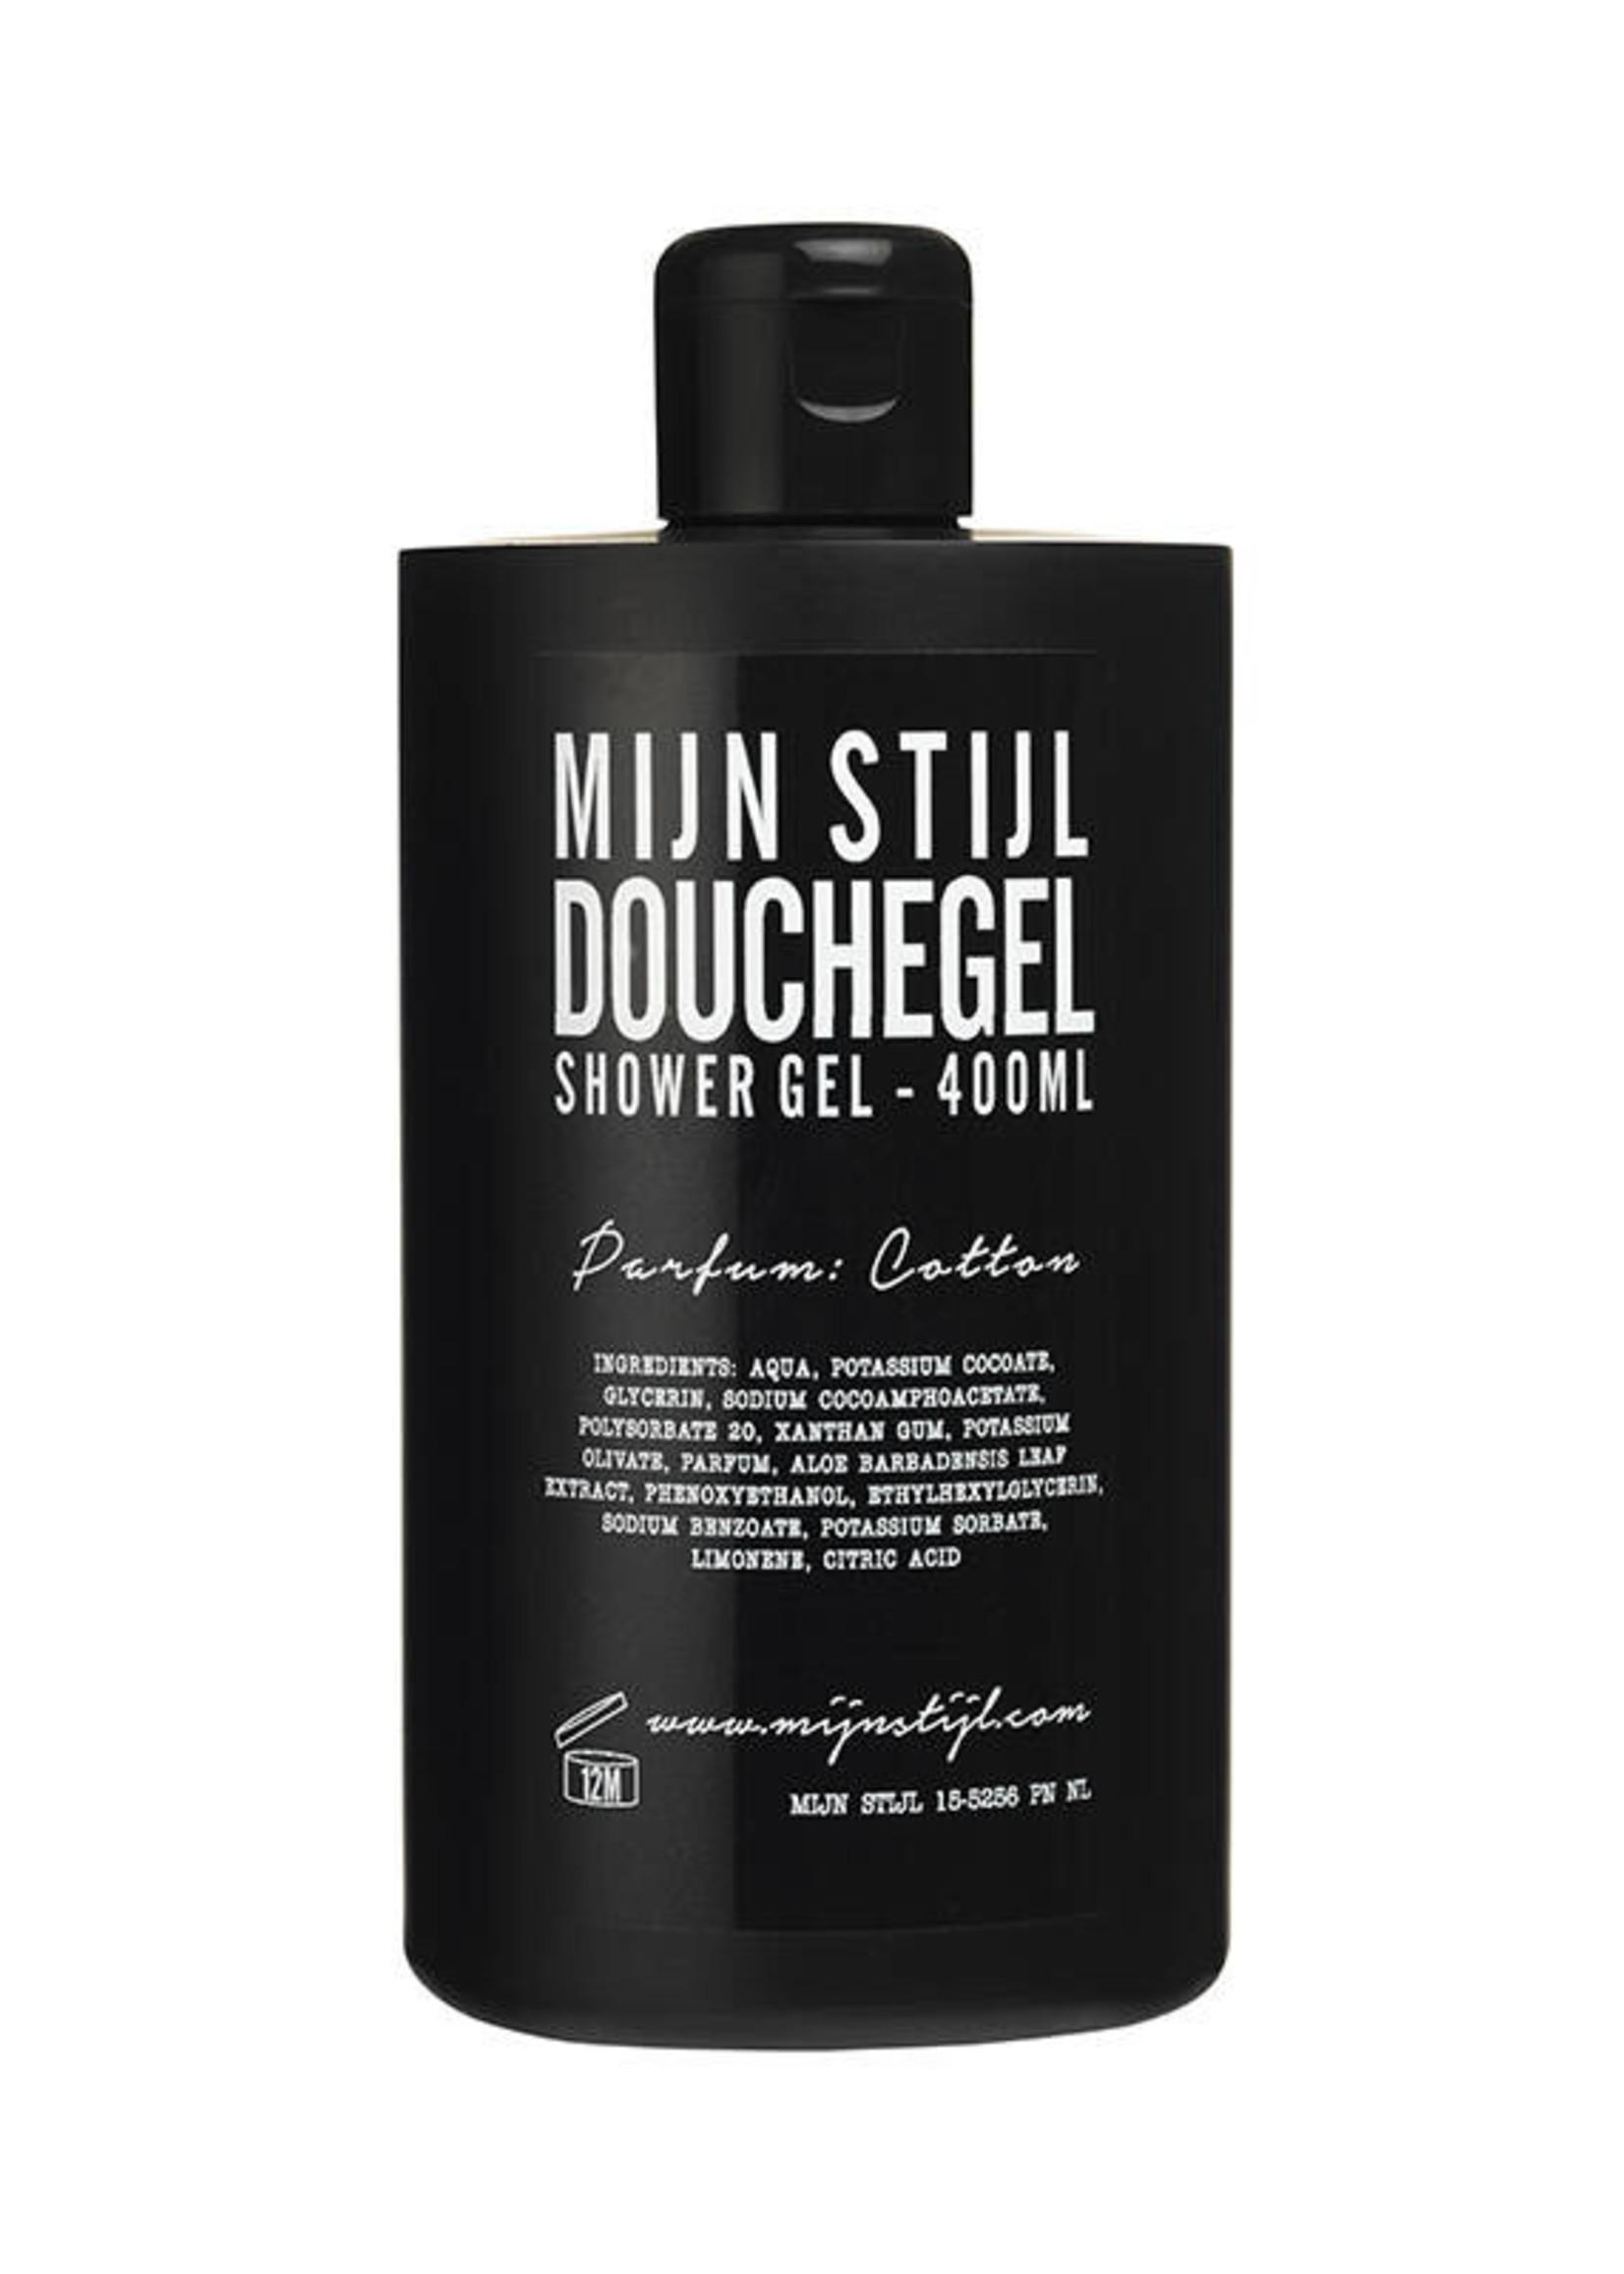 Mijn stijl Douchegel Parfum Cotton 400 ml (zwarte fles)